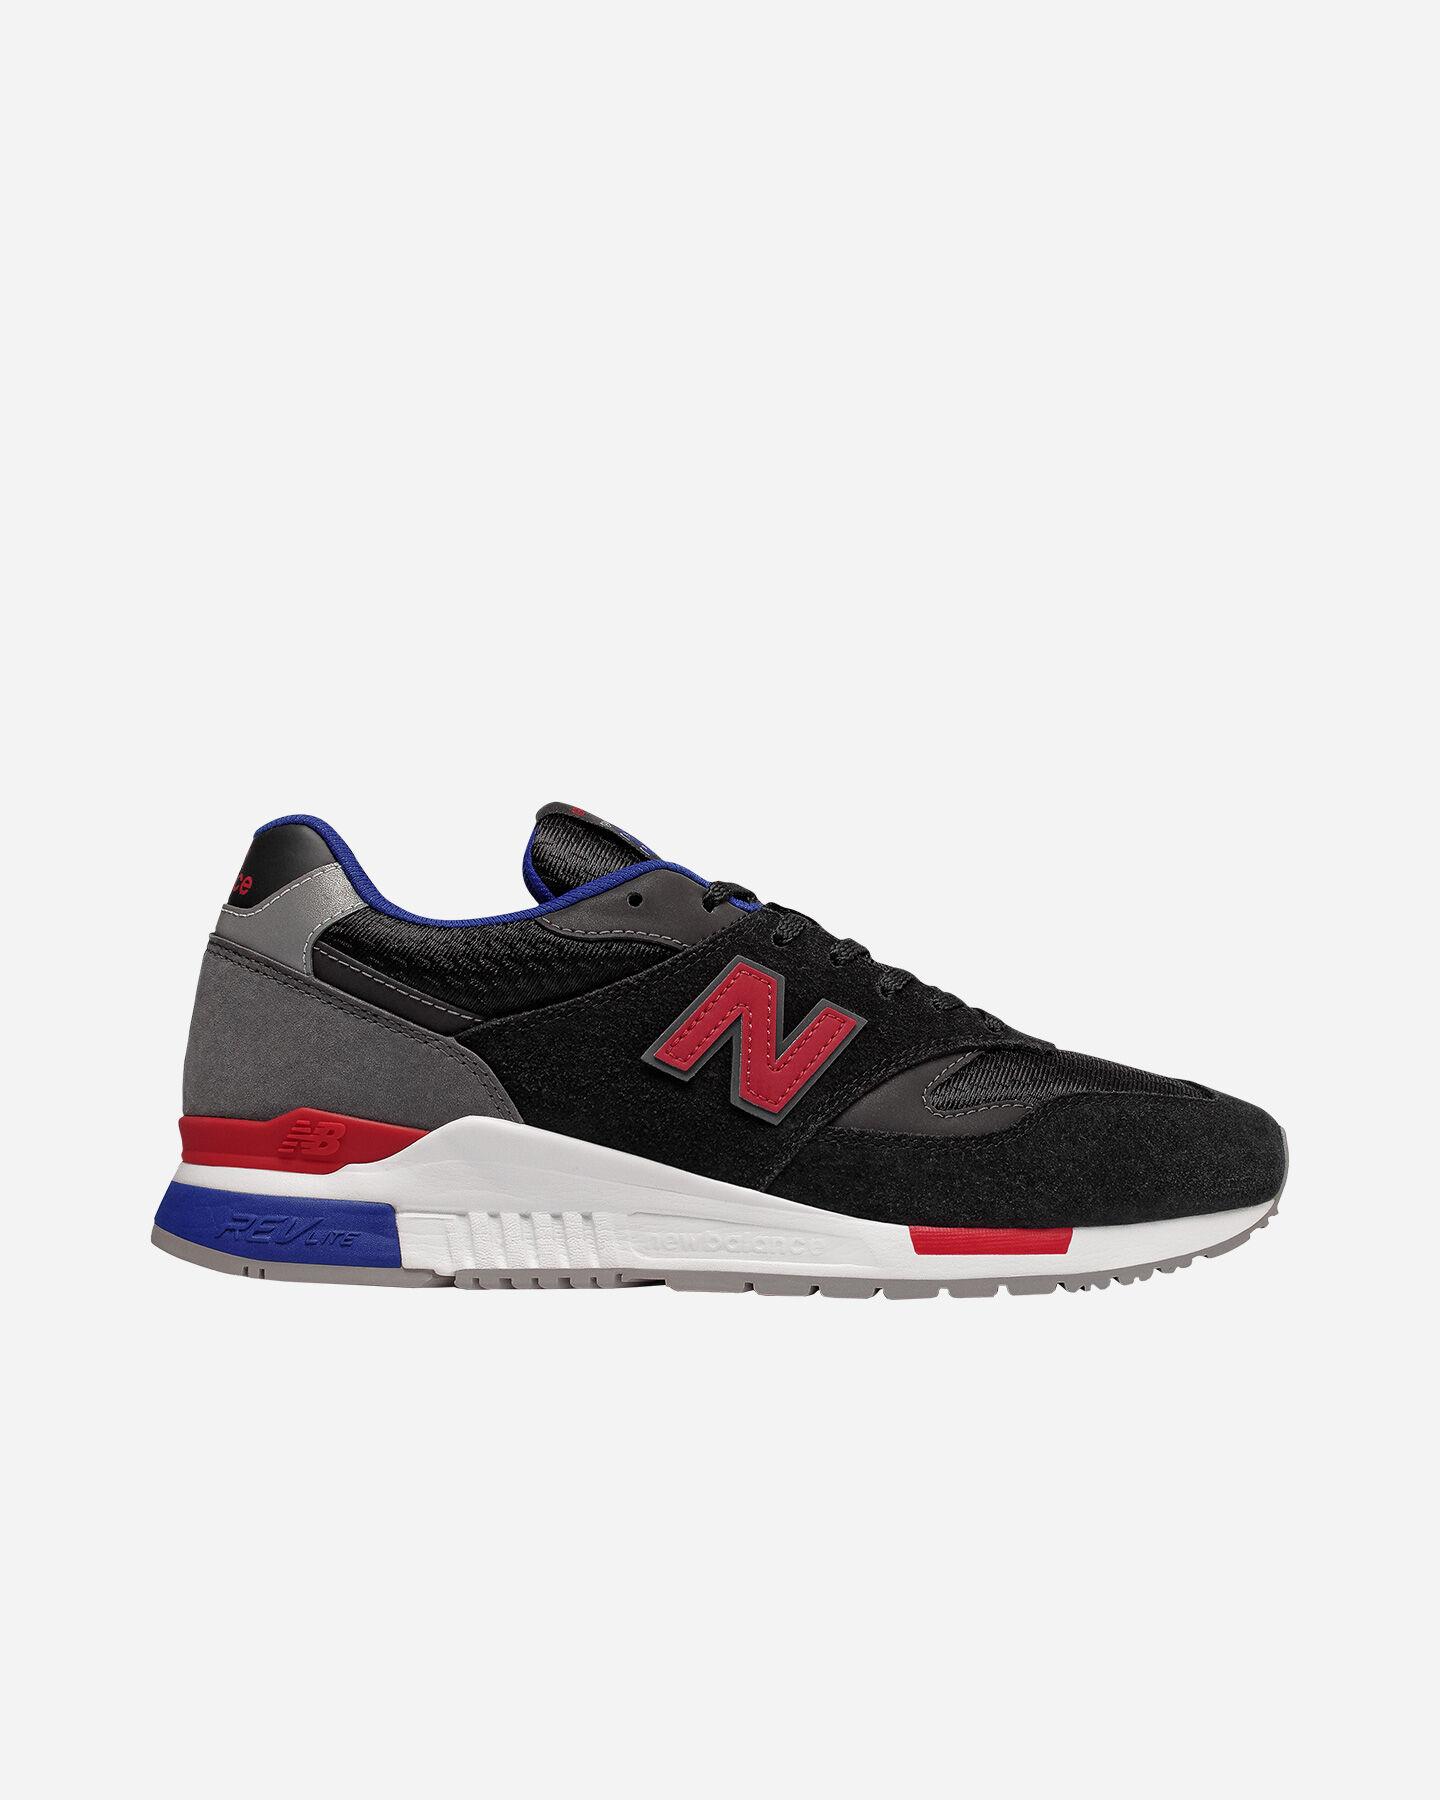 scarpe uomo new balance 840